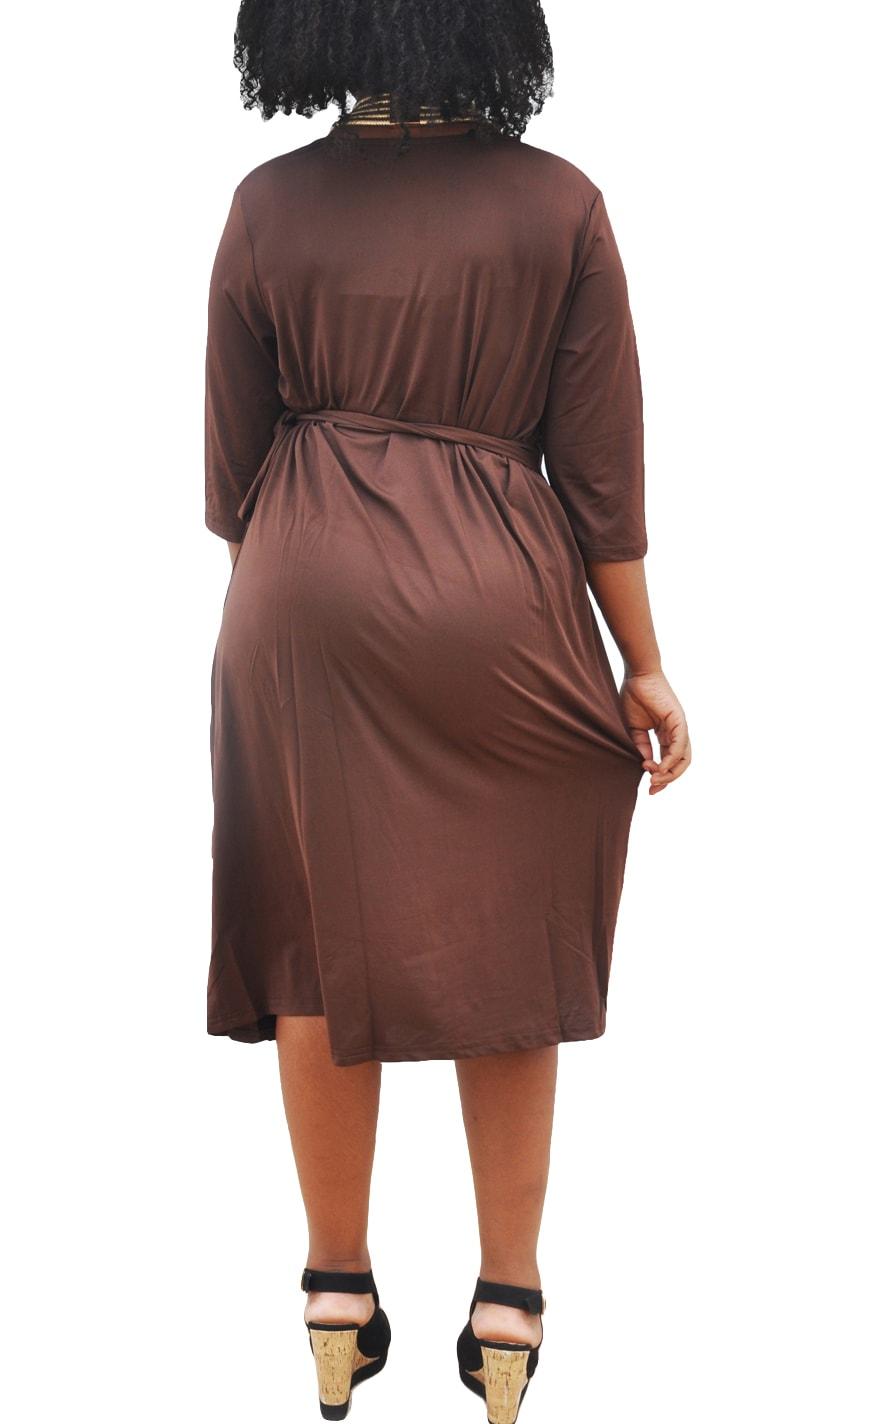 M0281 brown3 Short Sleeve Dresses maureens.com boutique